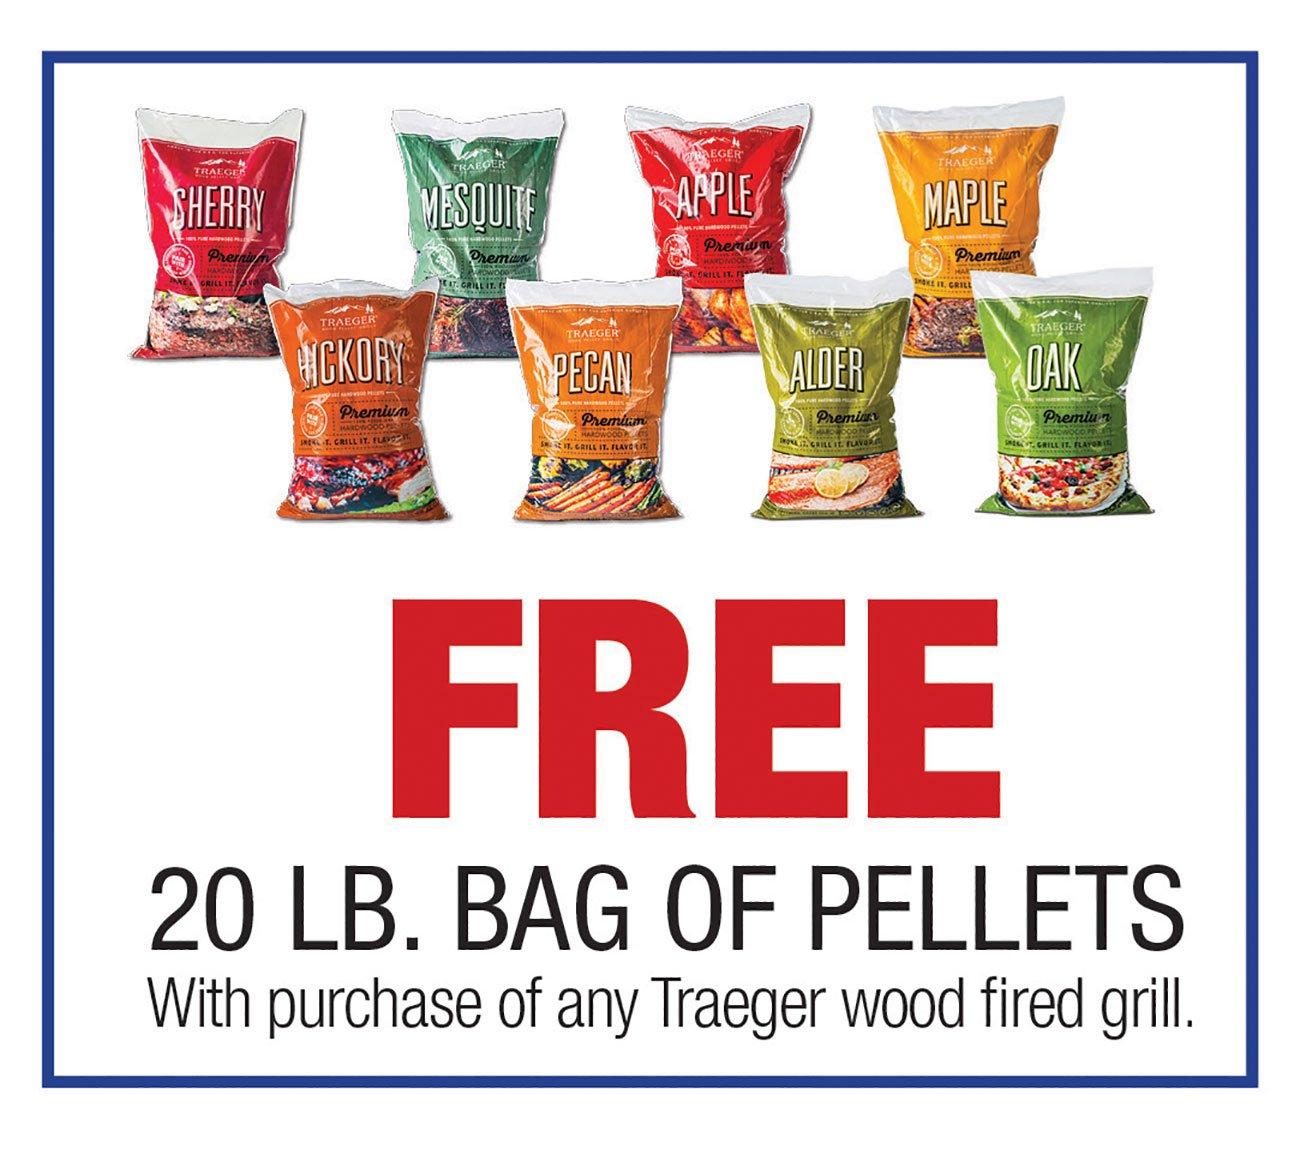 Free-Bag-Of-Pellets-Stripe